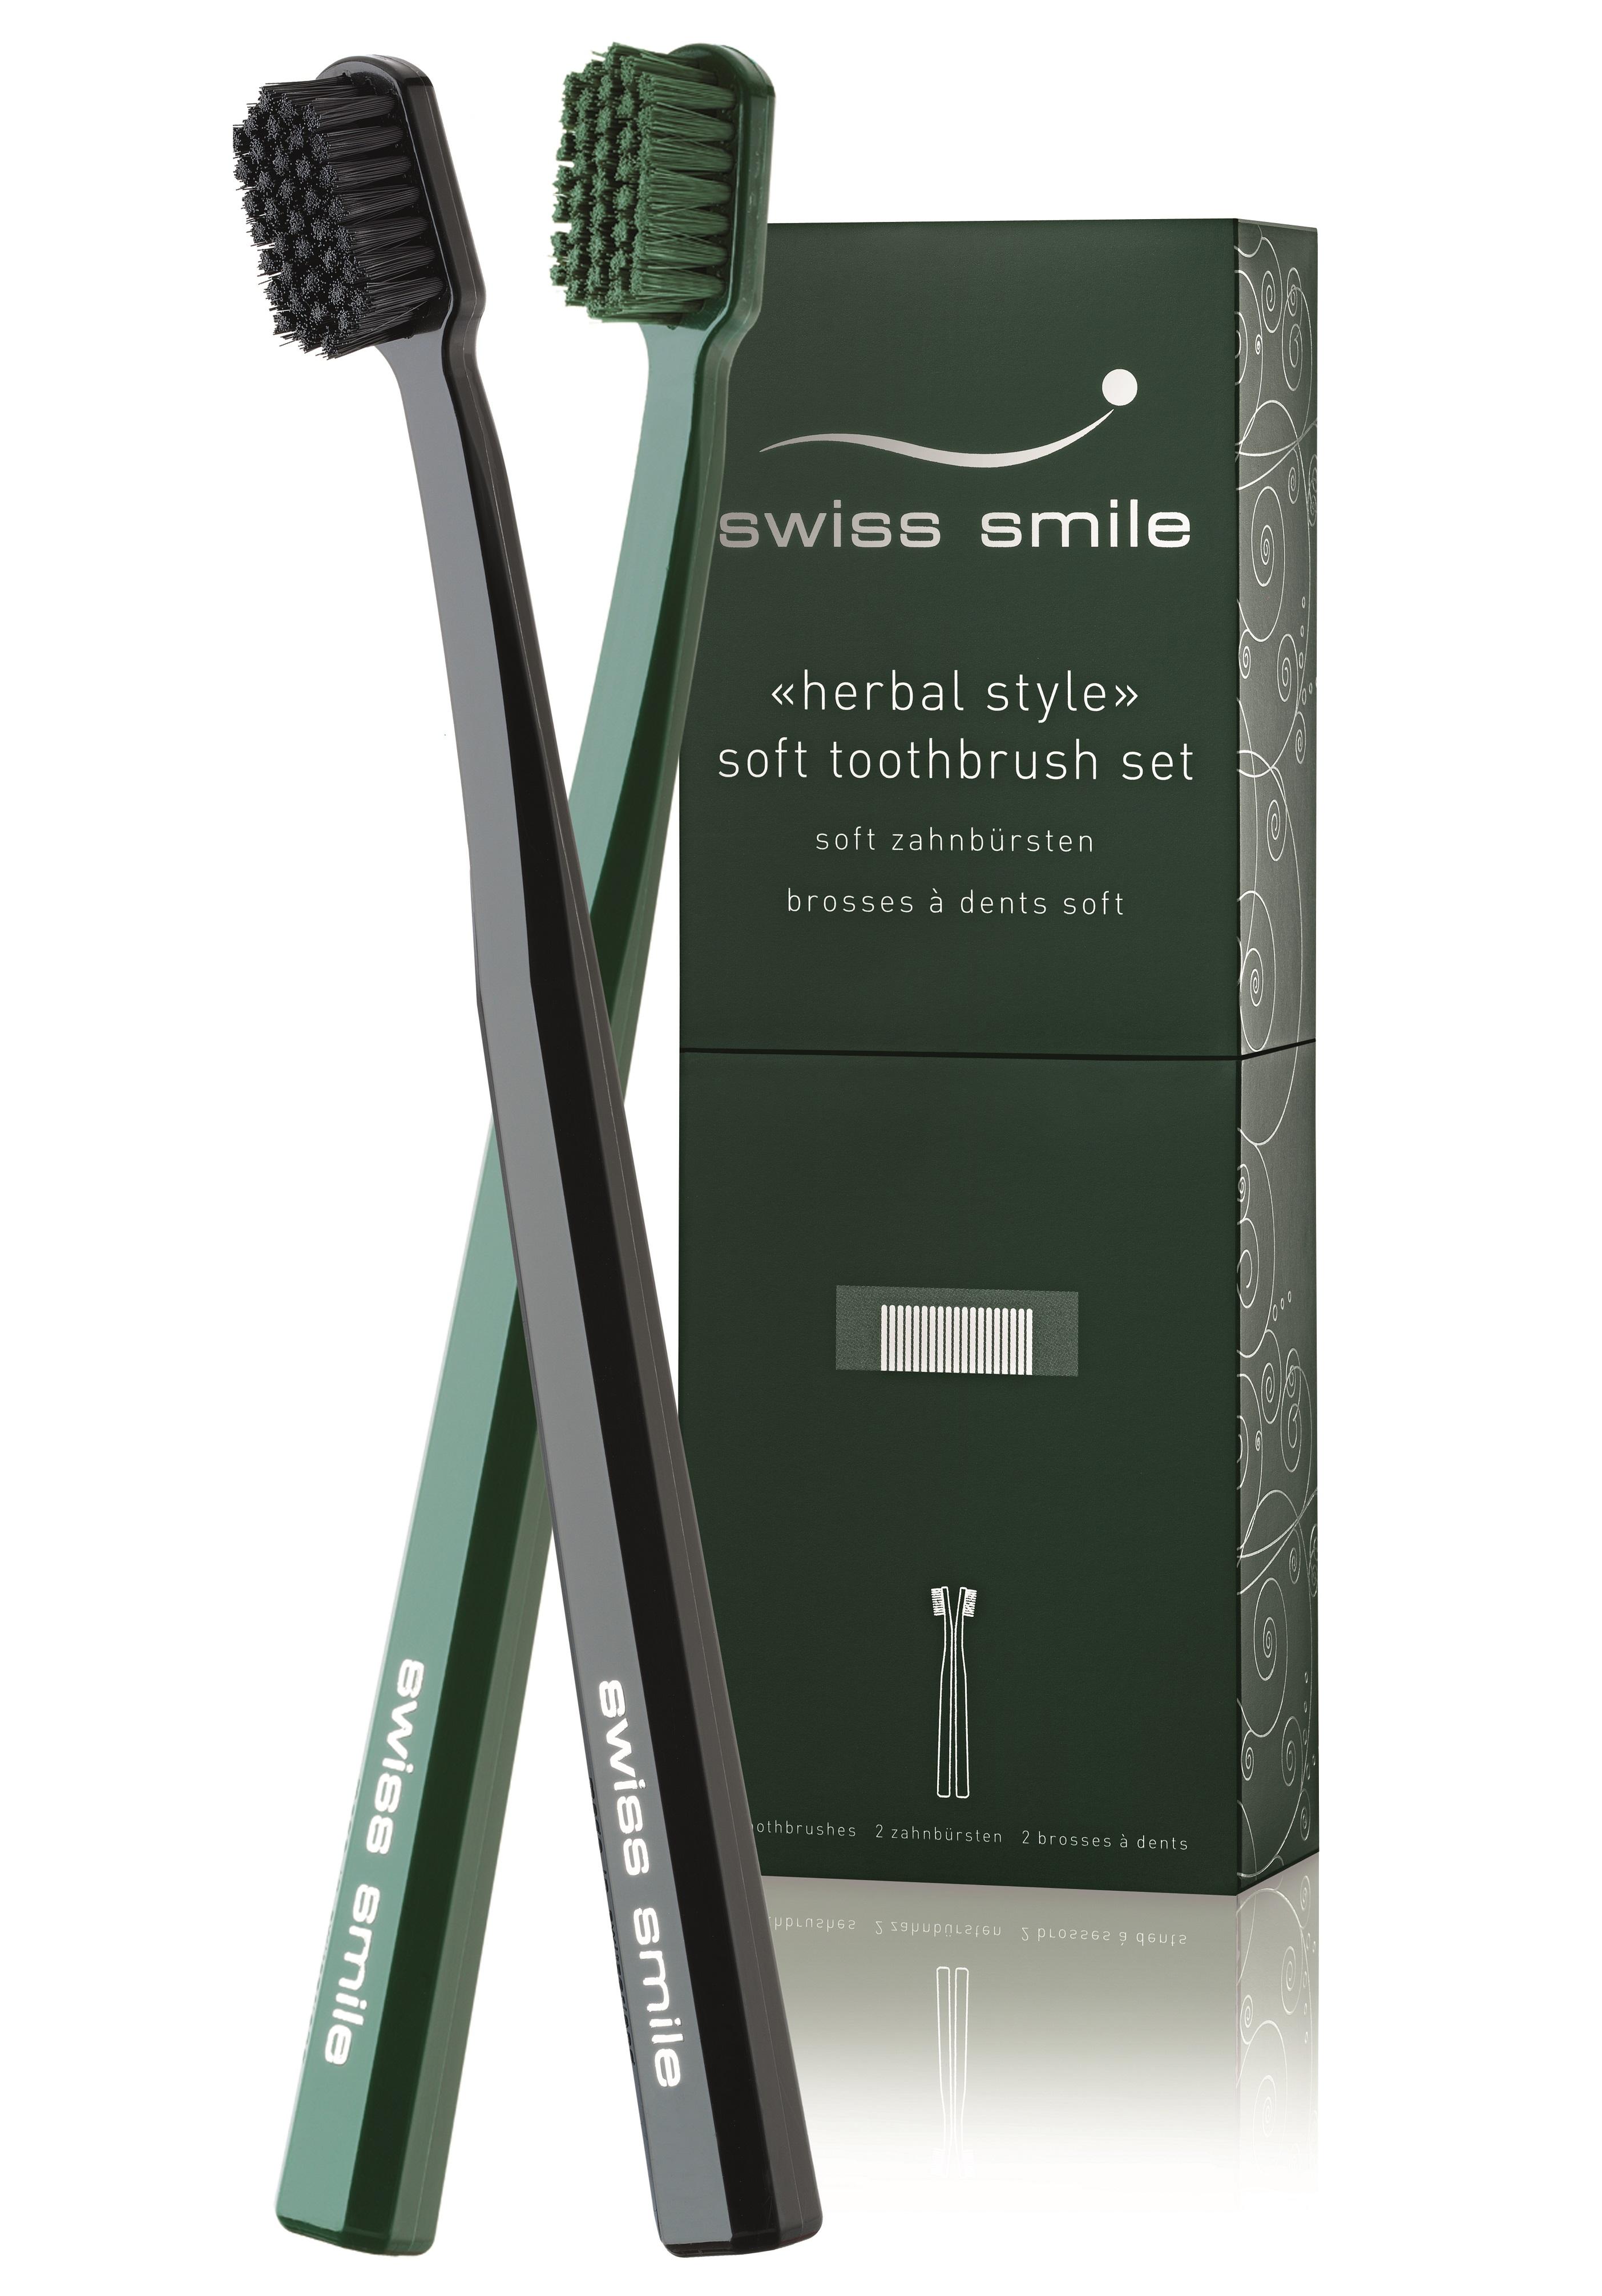 Купить SWISS SMILE Набор мягких зубных щёток Базель / Basel 2 шт